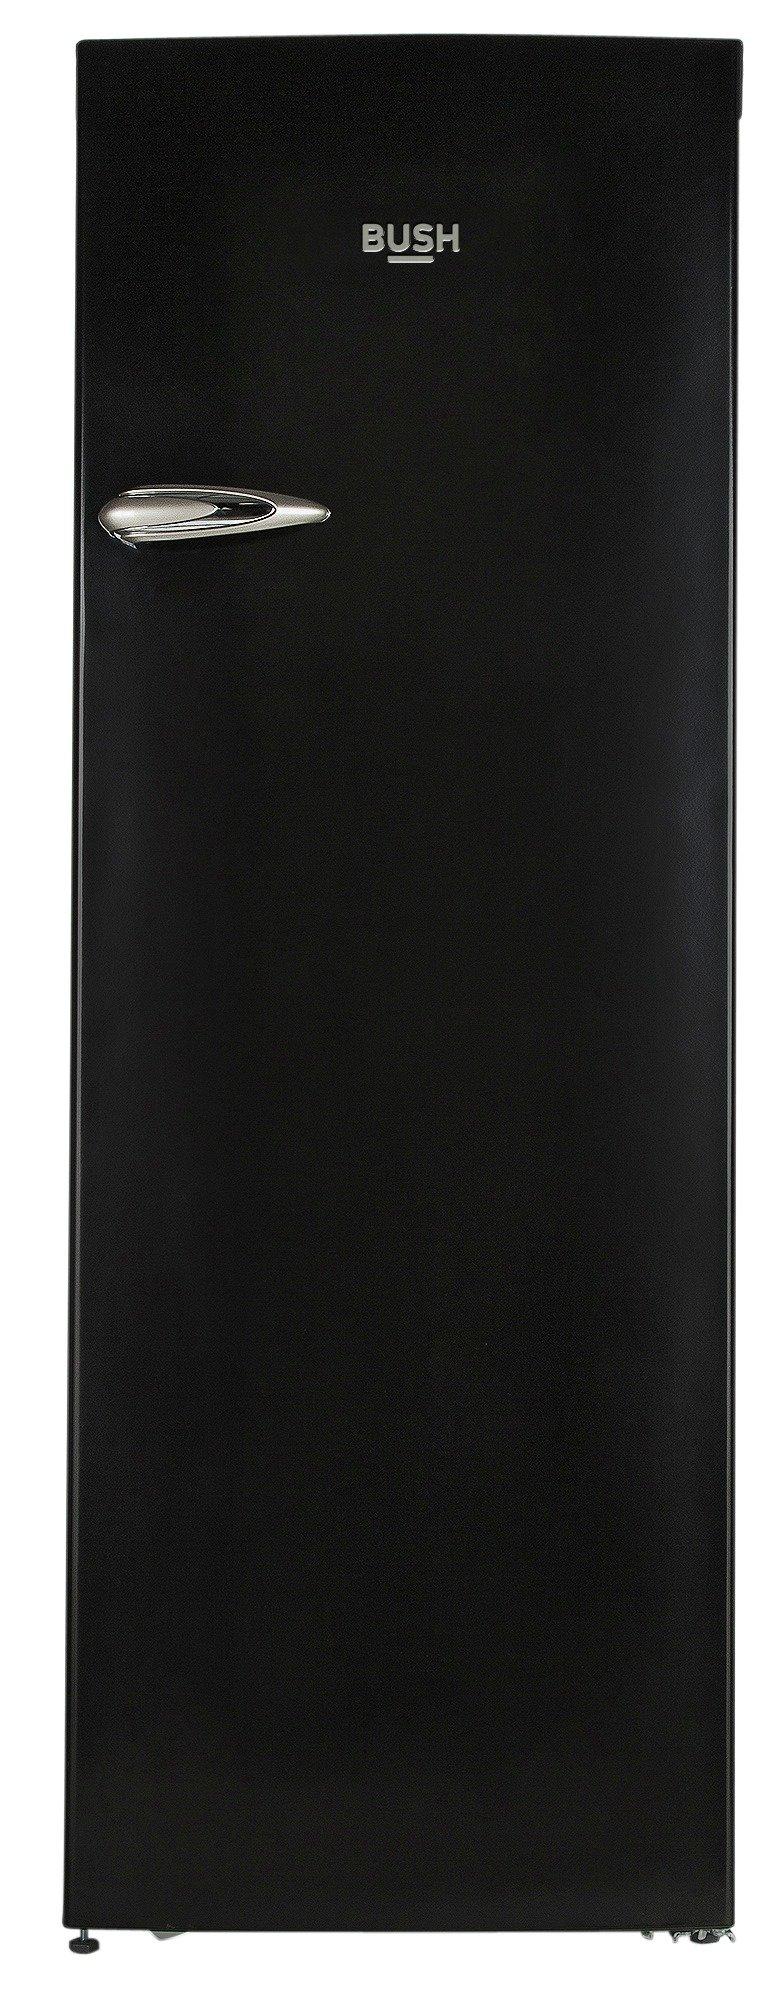 Image of Bush - Classic BRTL60170 Retro - Tall Fridge - Black